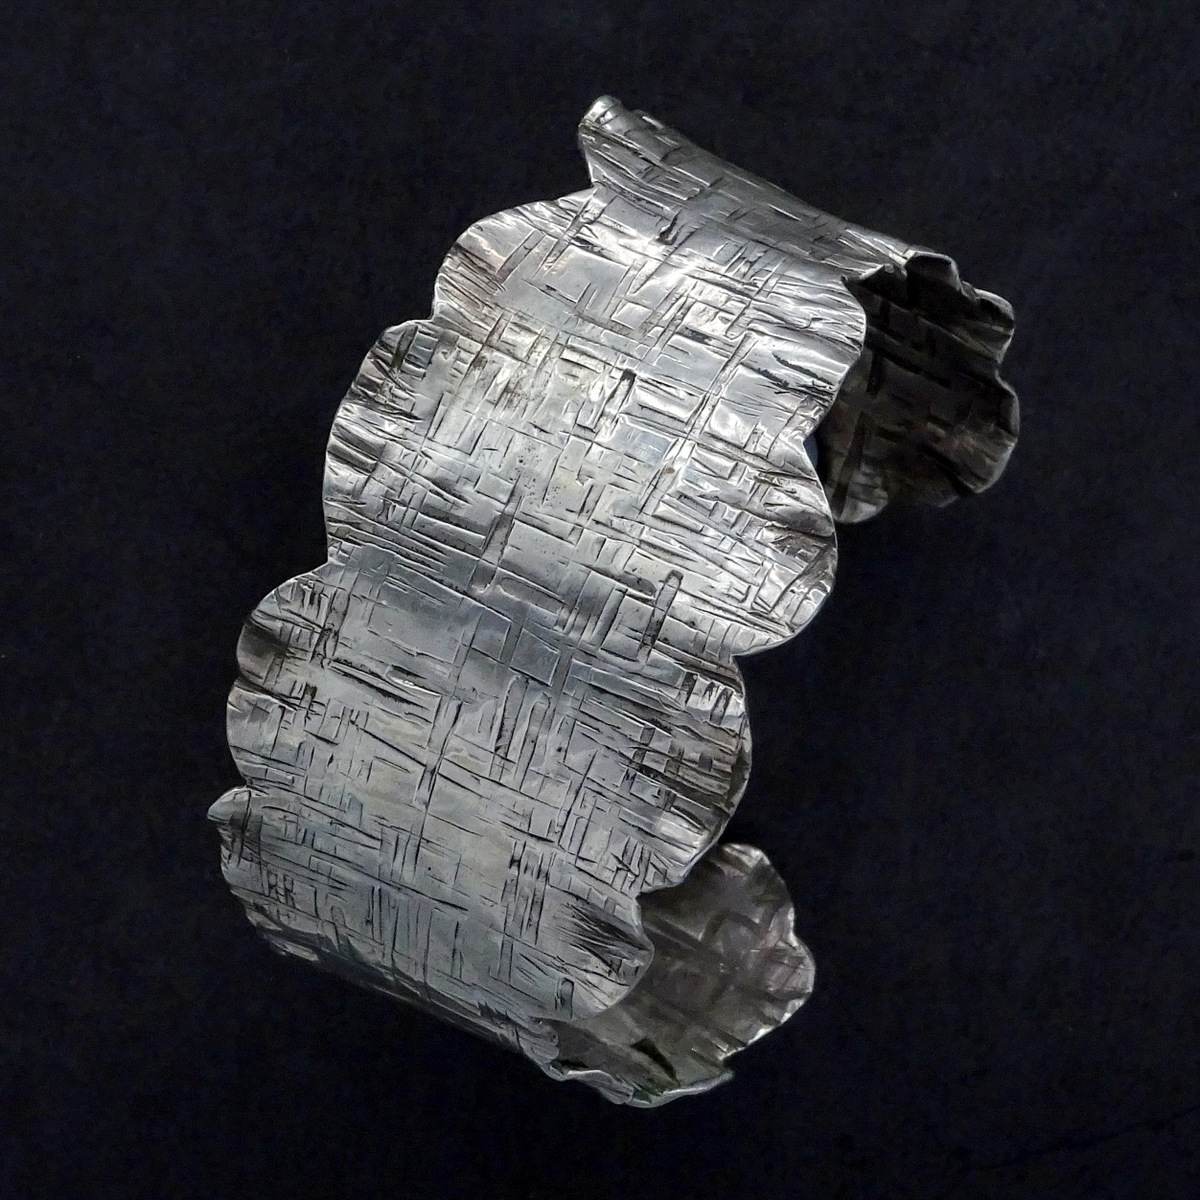 1-Silver Bracelets, Handcrafted Jewelry, Sylvia McCollum-011.JPG